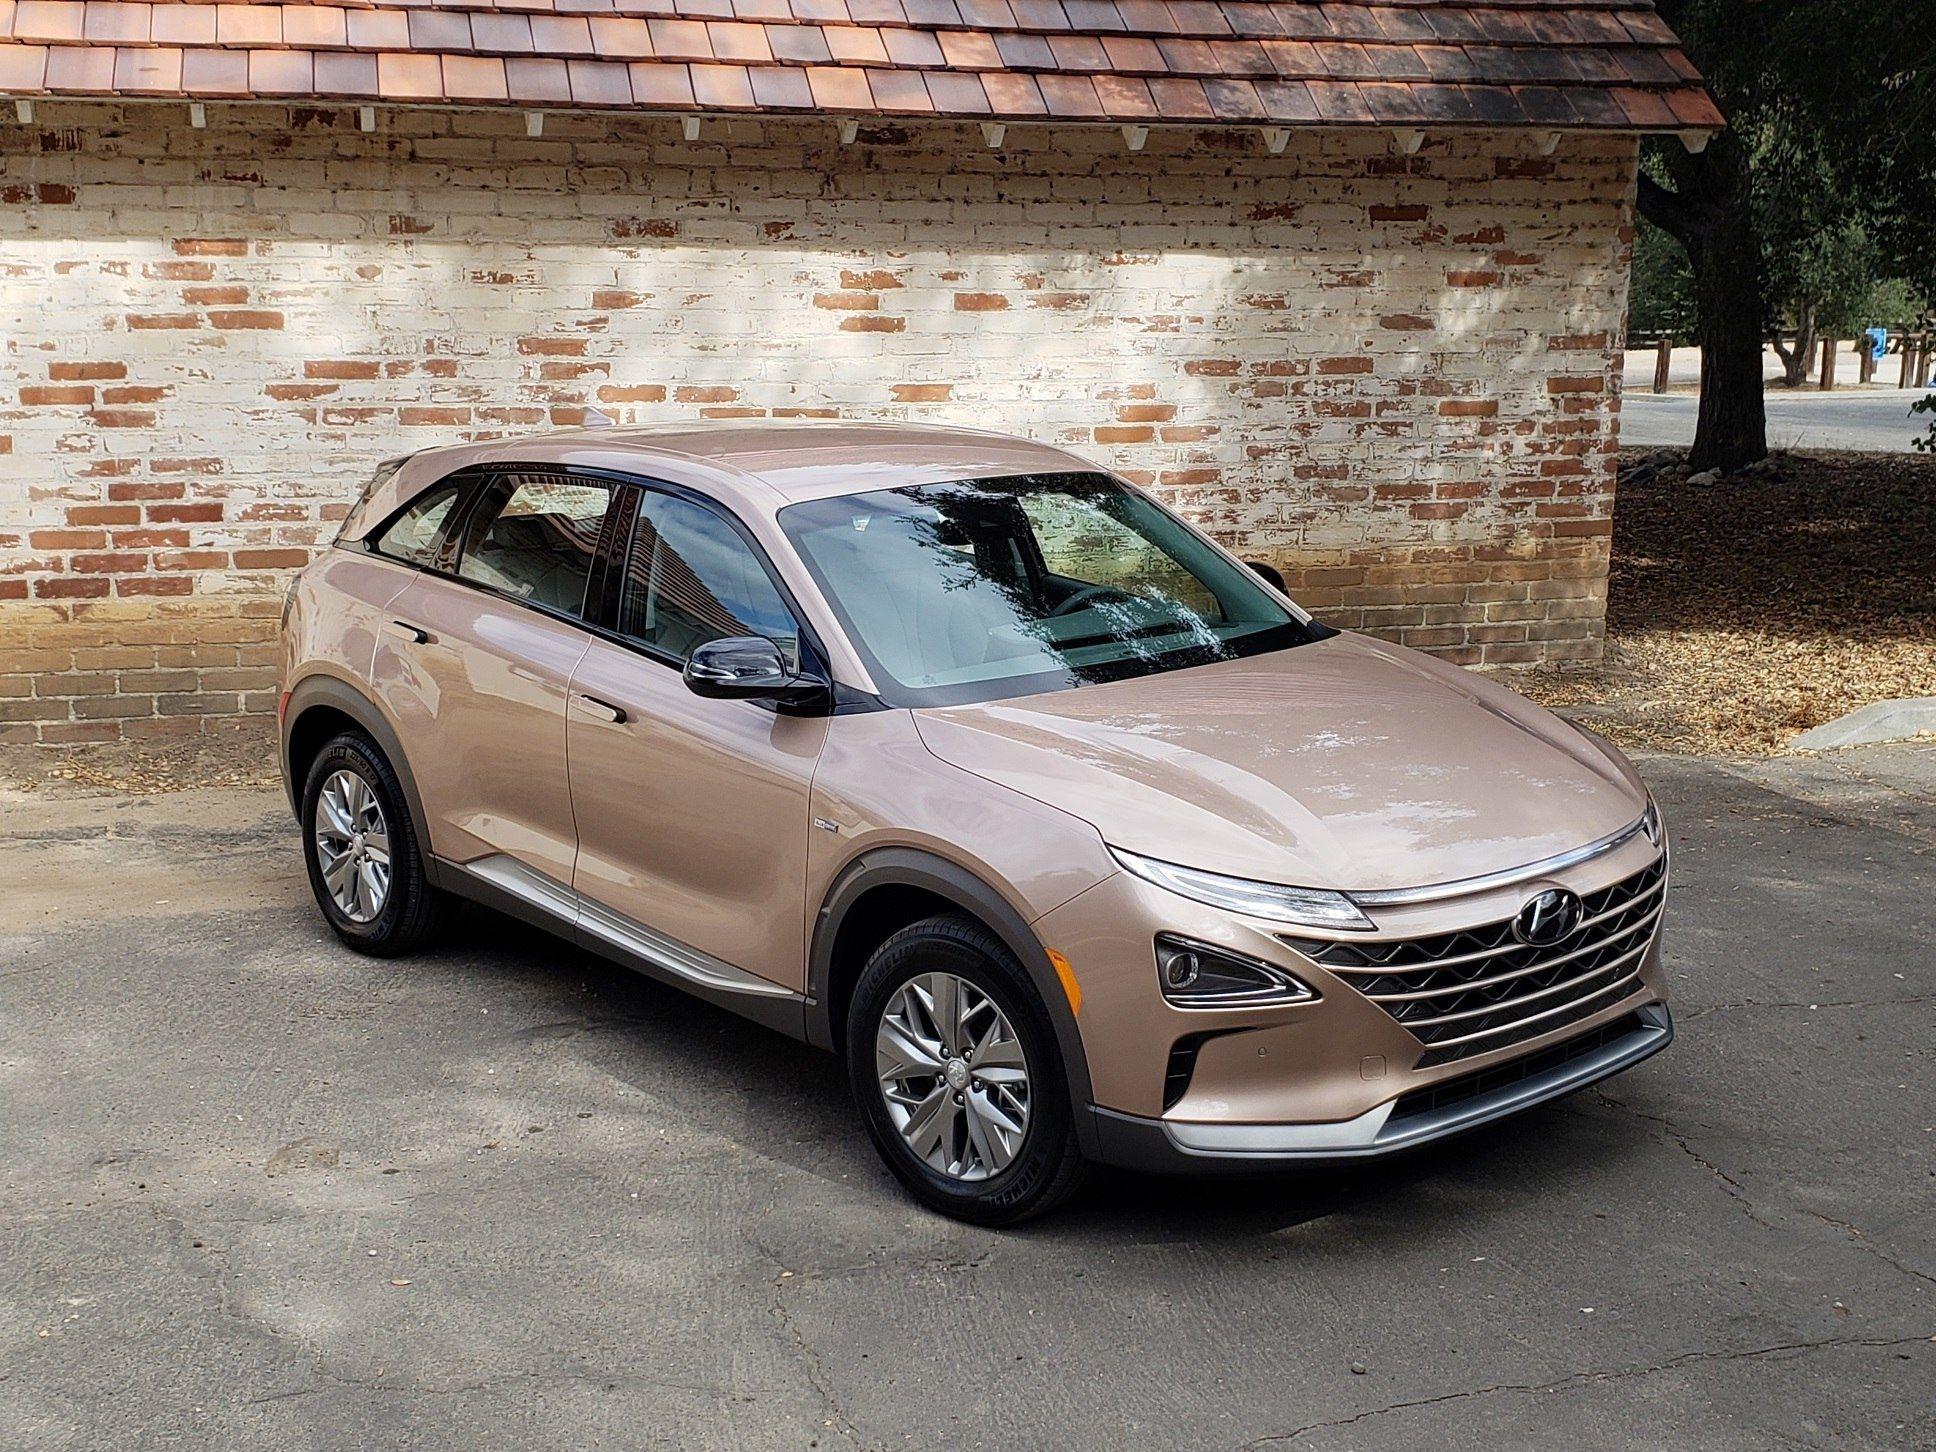 when will 2020 Hyundai Nexo For Sale look like New